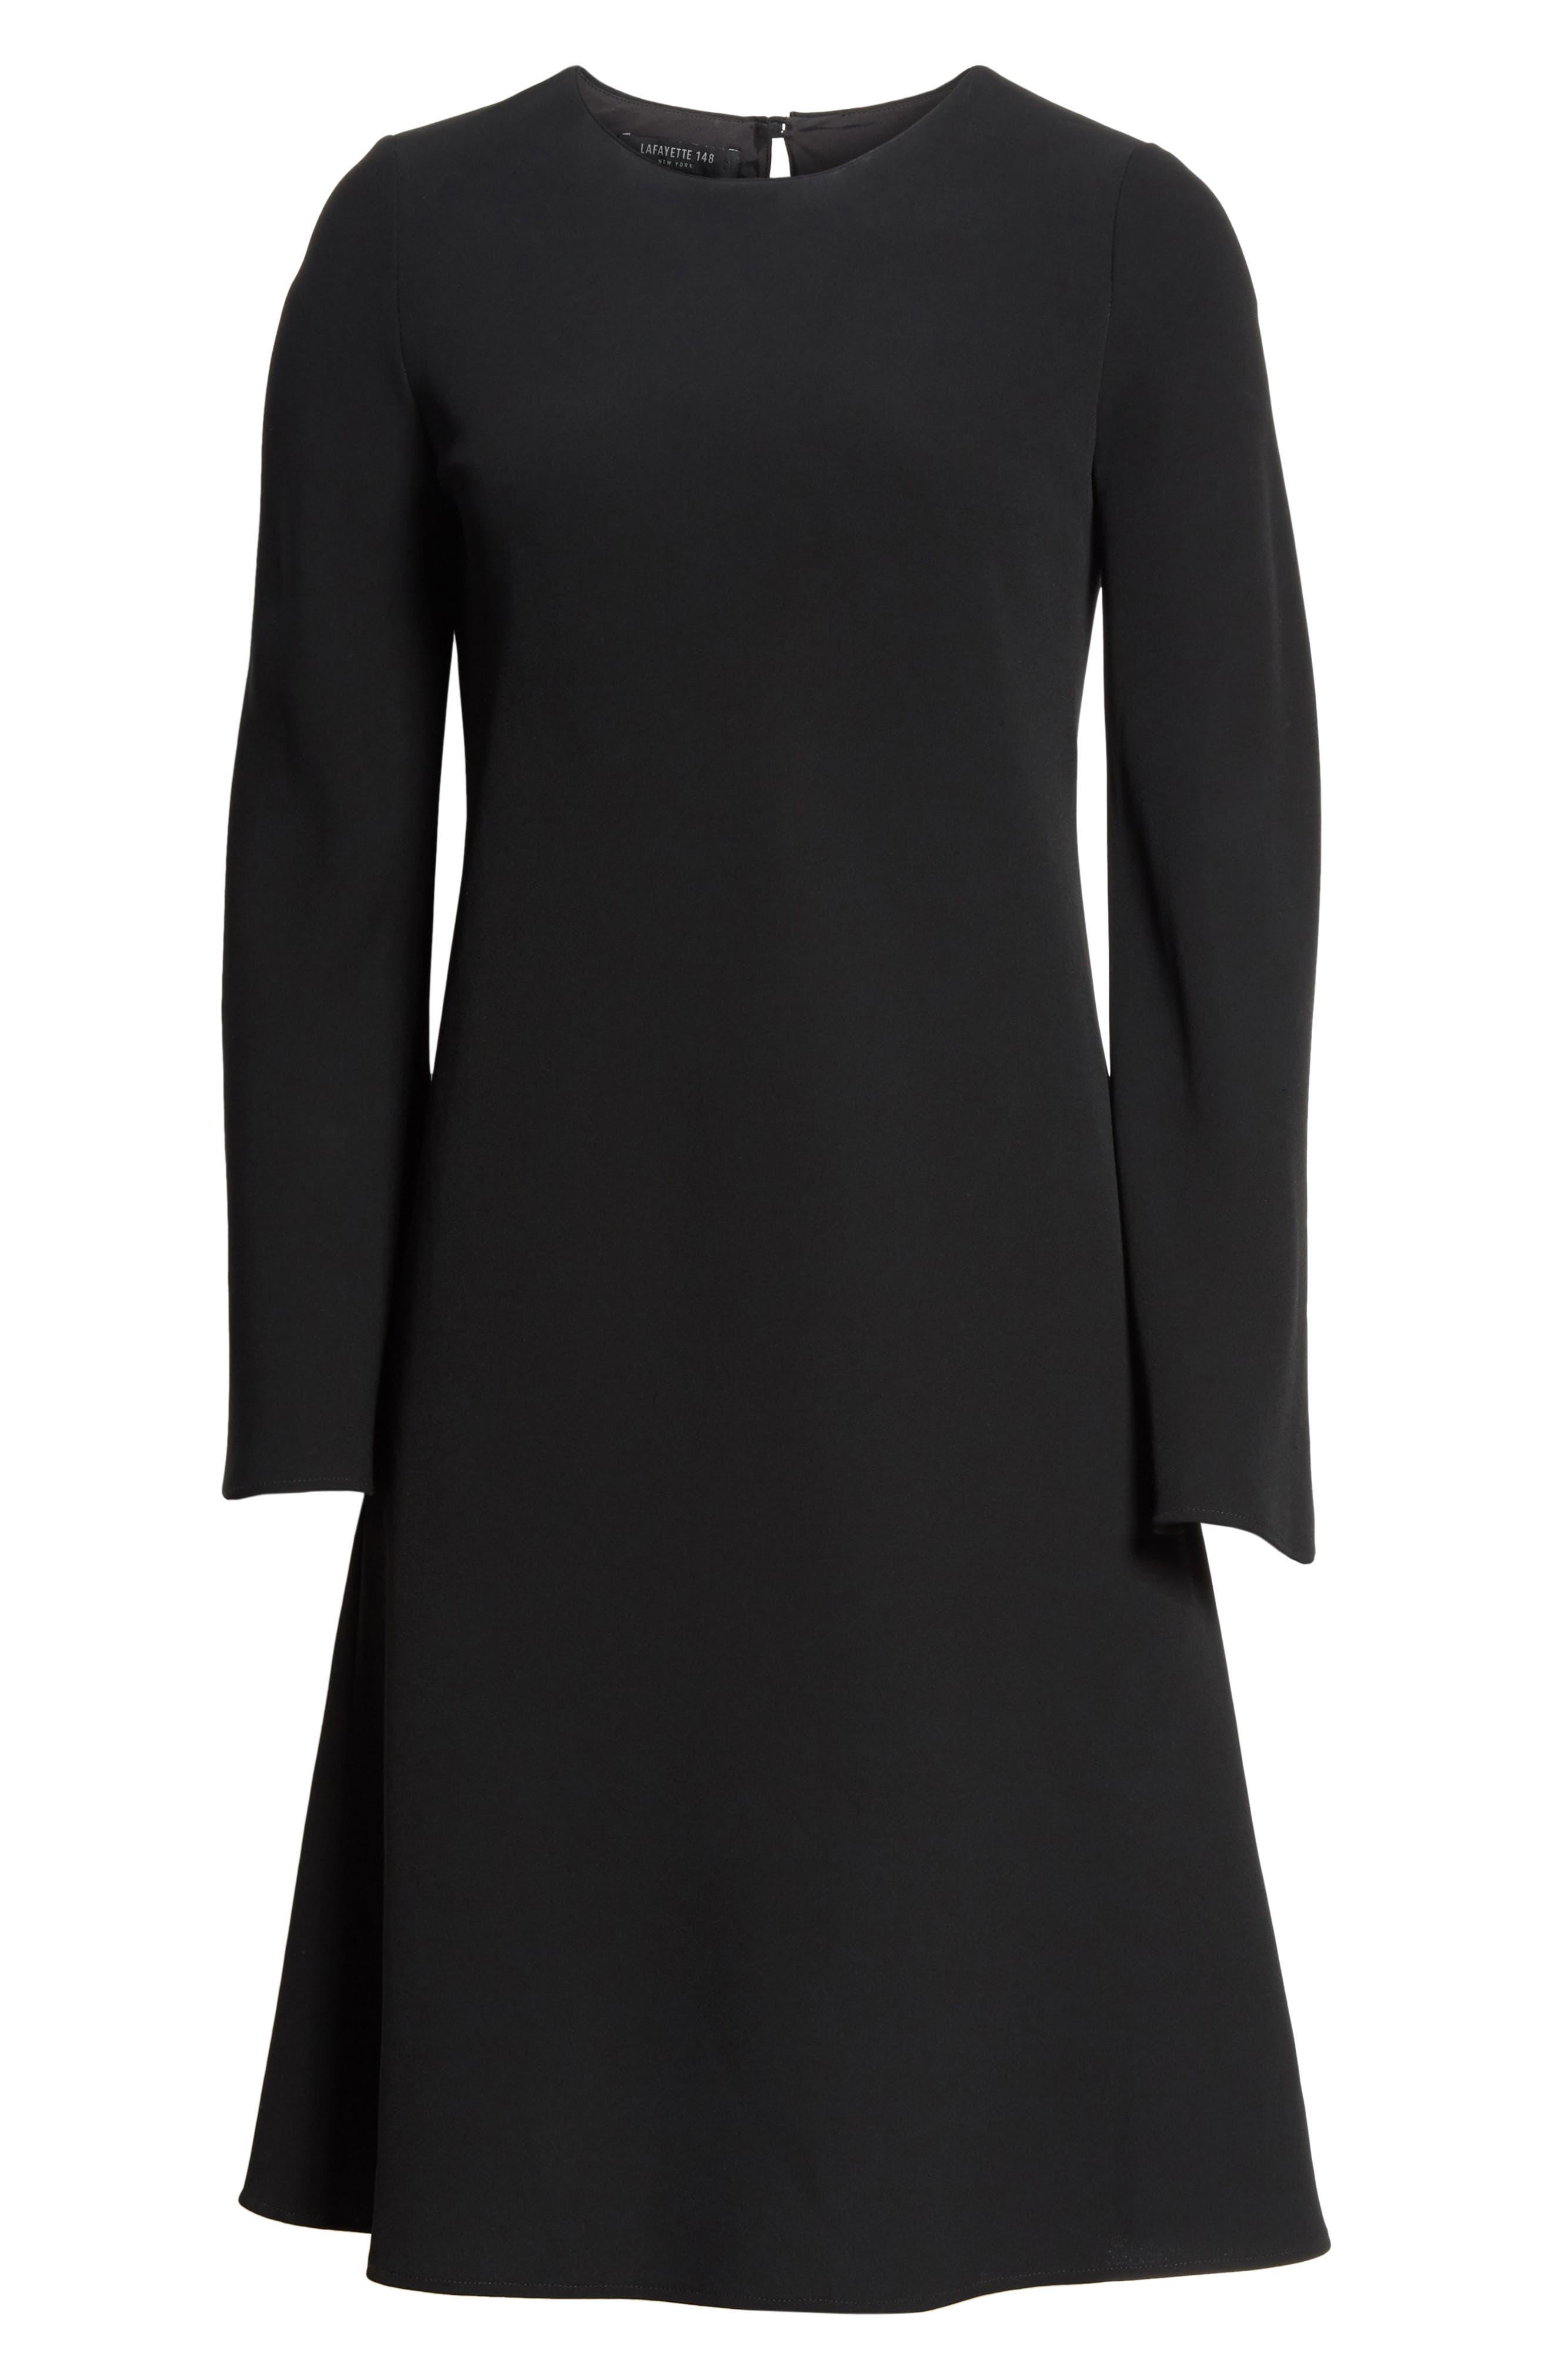 Kalitta Finesse Crepe Dress,                             Alternate thumbnail 6, color,                             001